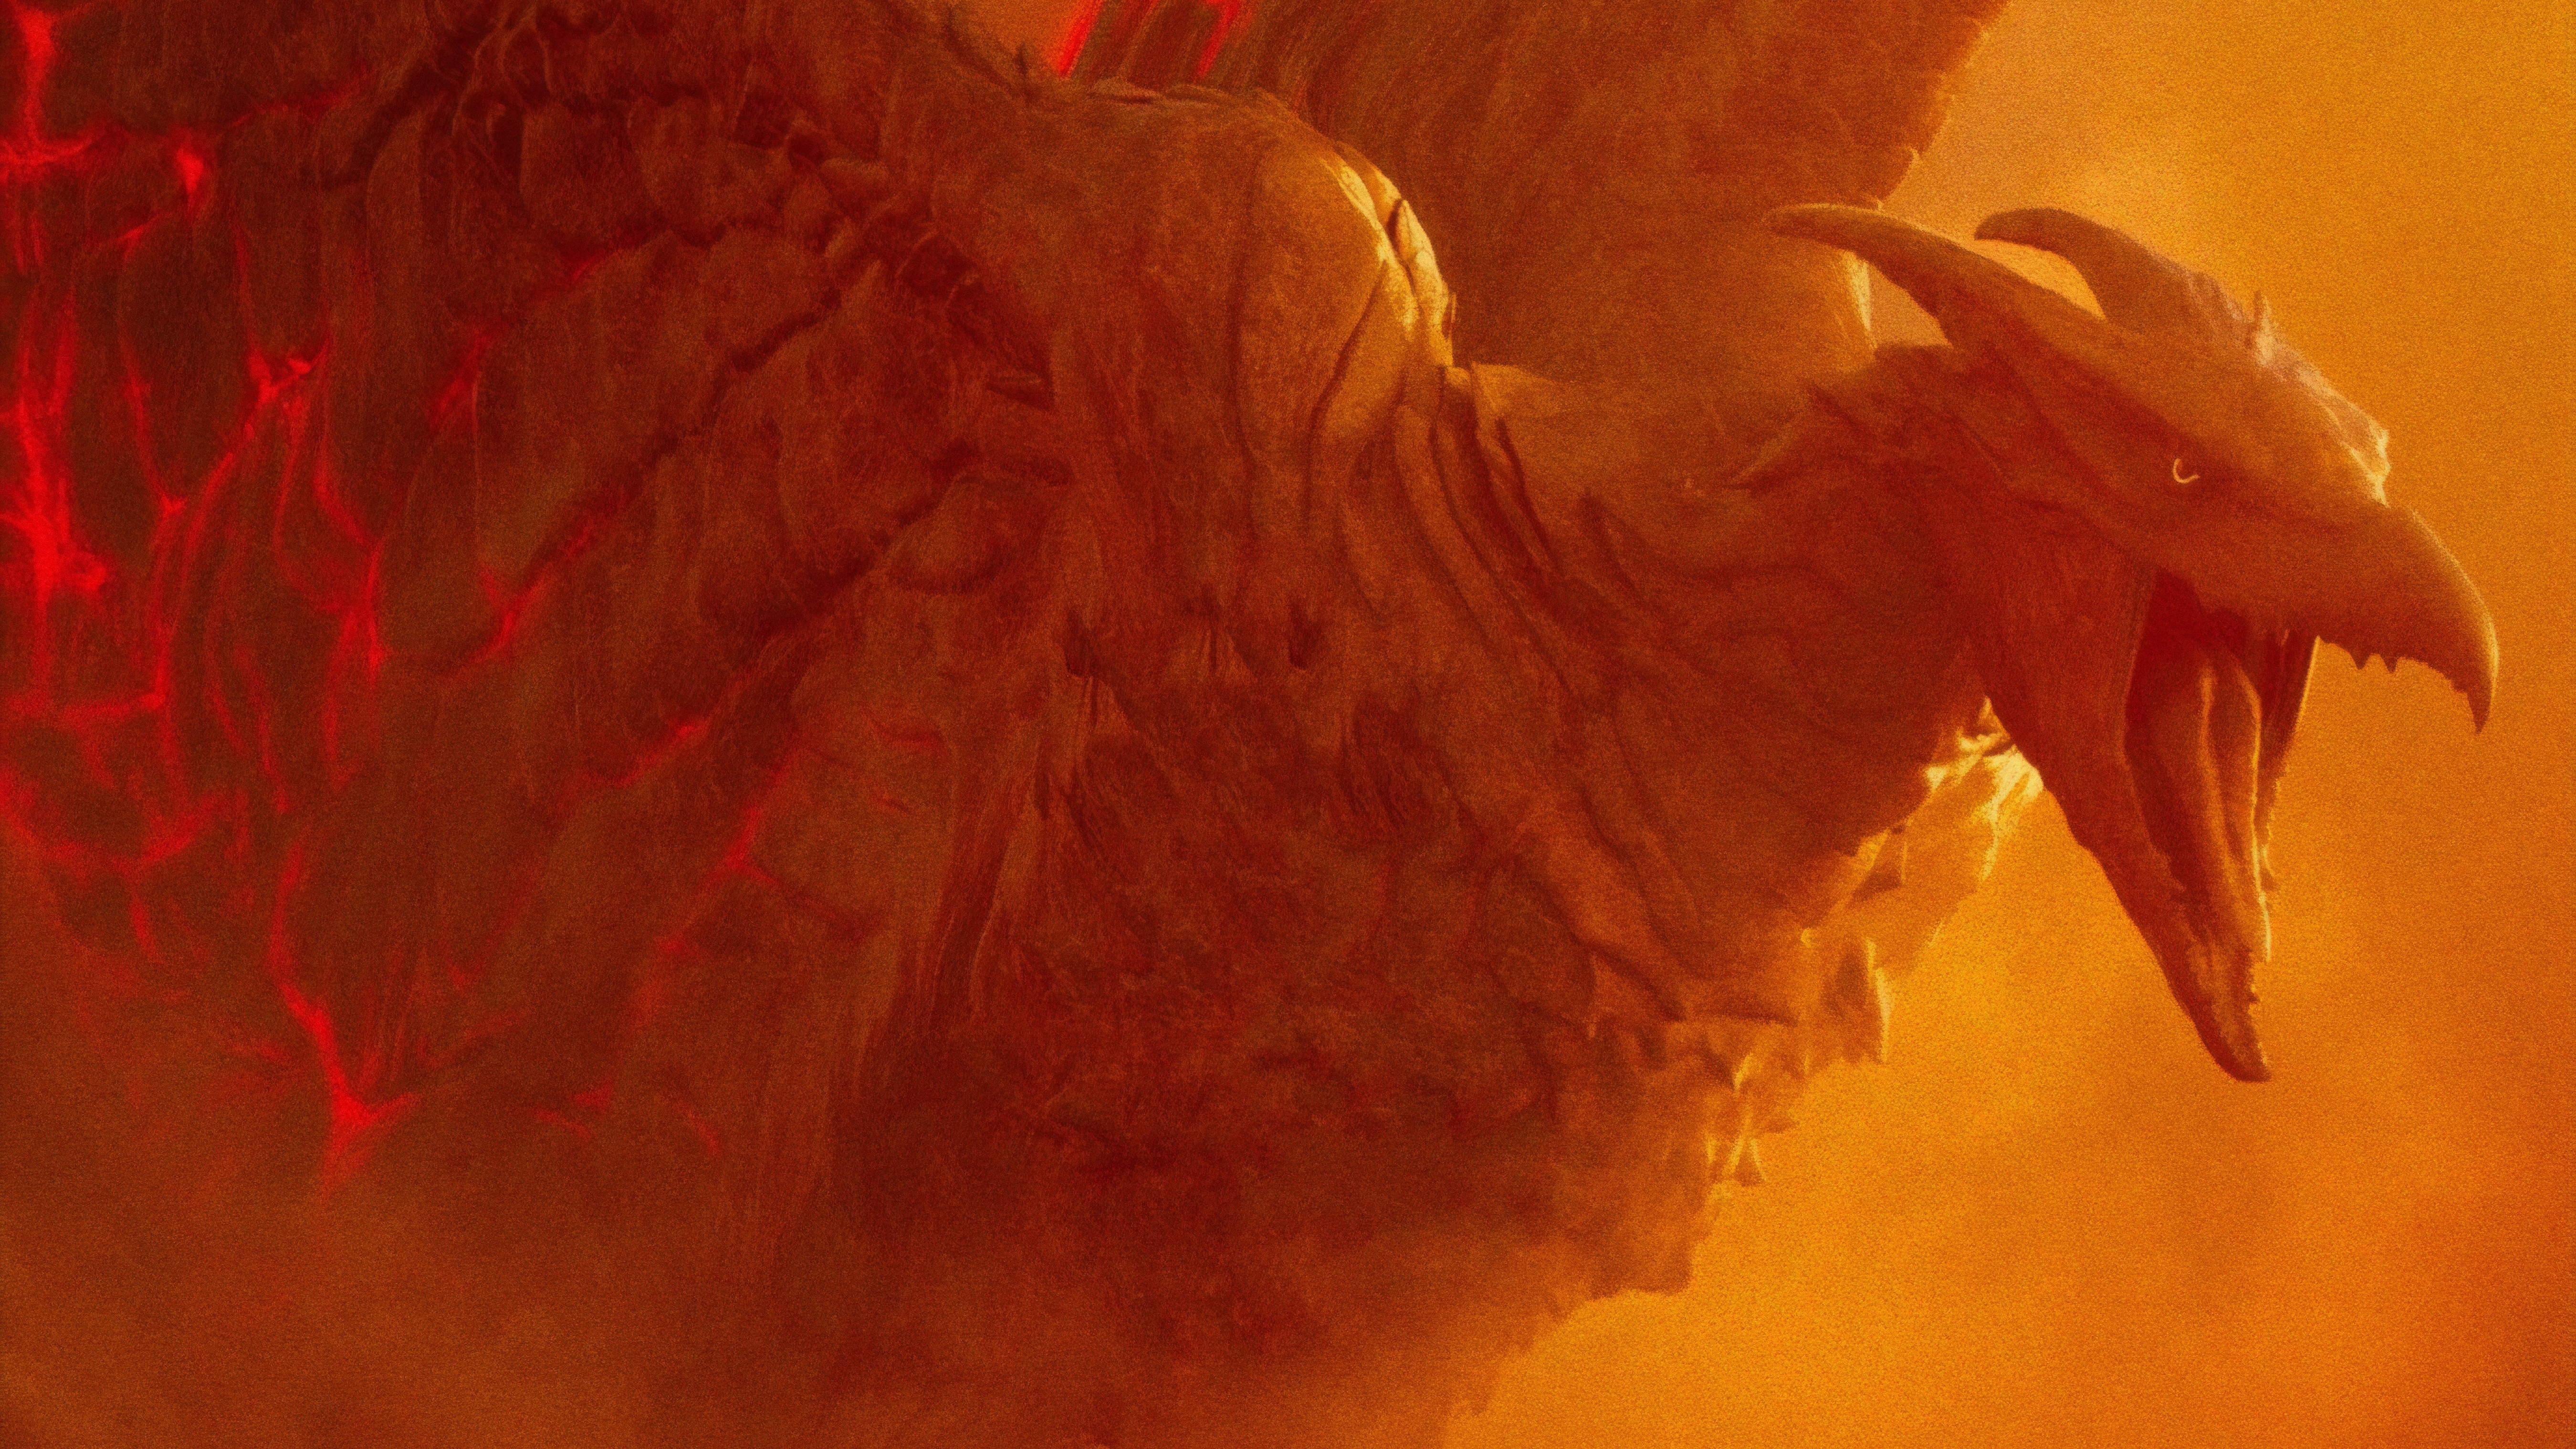 Rodan Godzilla King Of The Monsters Hd Movies 4k Wallpapers